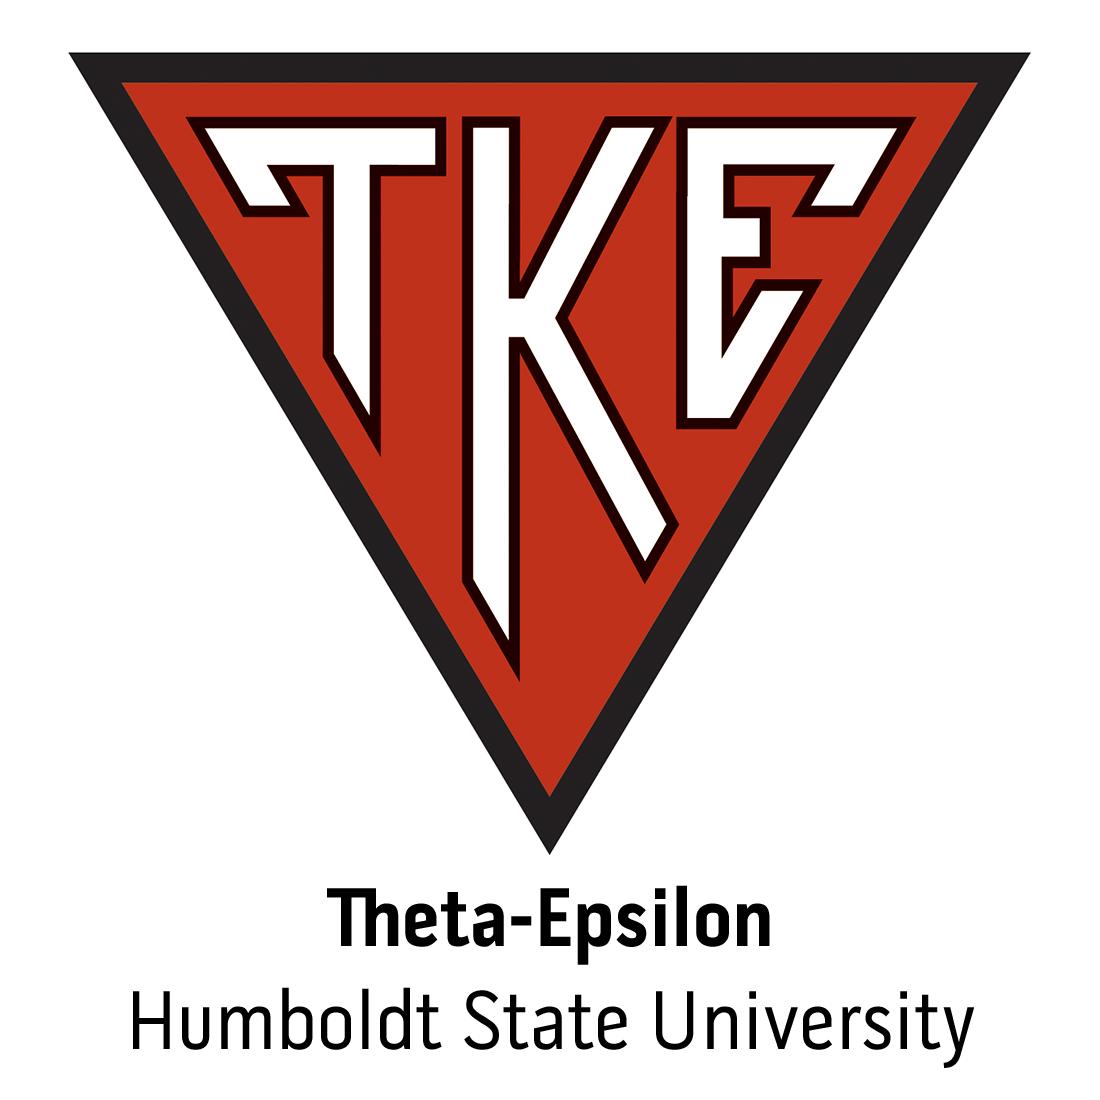 Theta-Epsilon Chapter at Humboldt State University